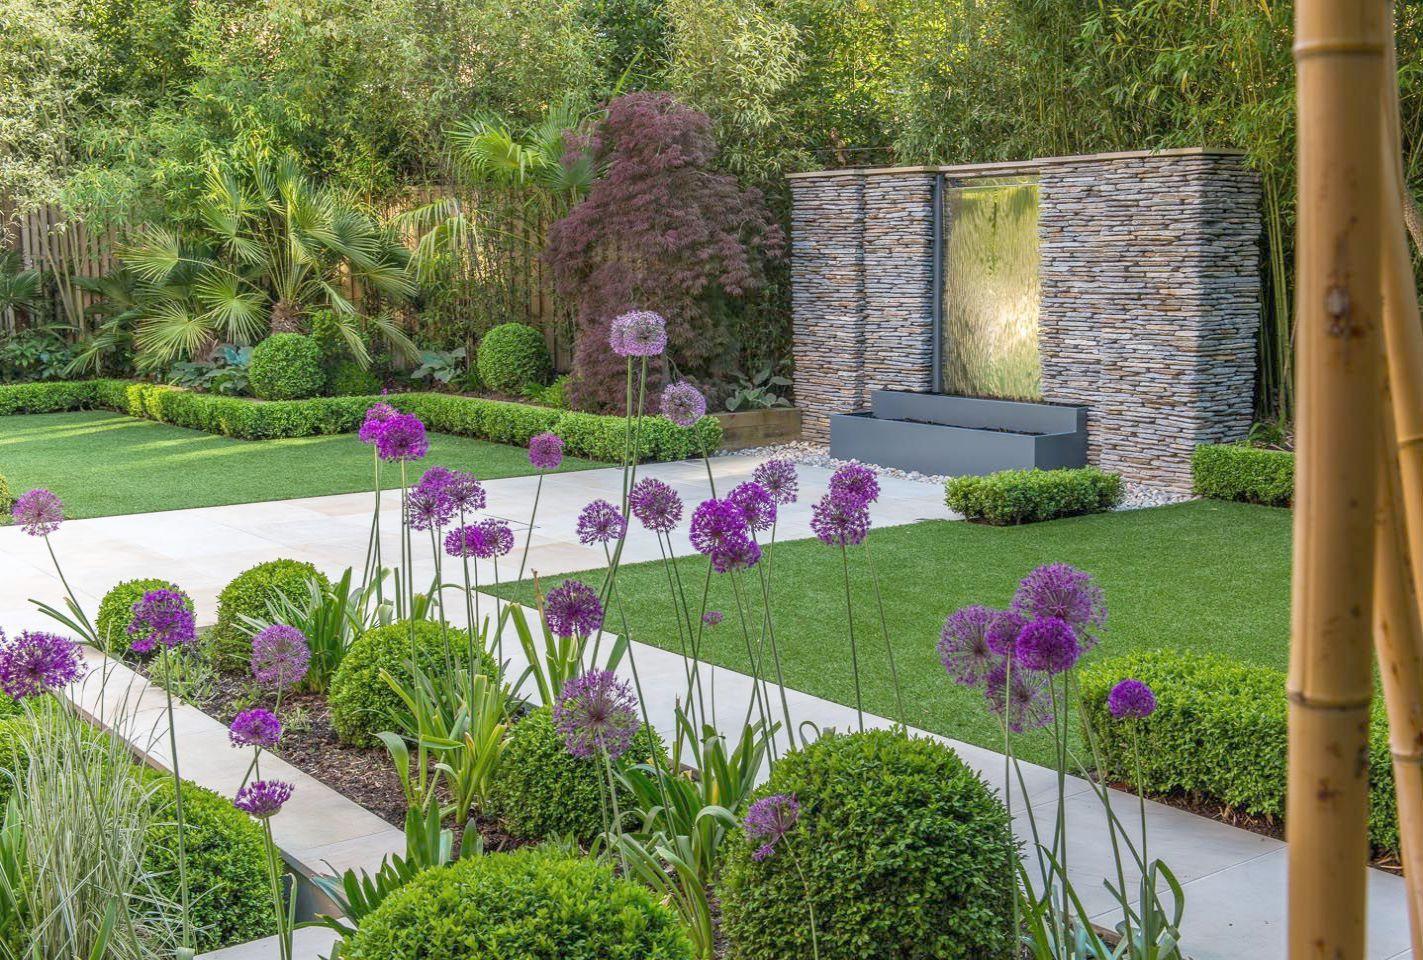 Landscape Gardening App That Landscape Gardening Courses Hampshire If Landscape Gardening Jobs Nottingham Where Garden Design Modern Garden Contemporary Garden